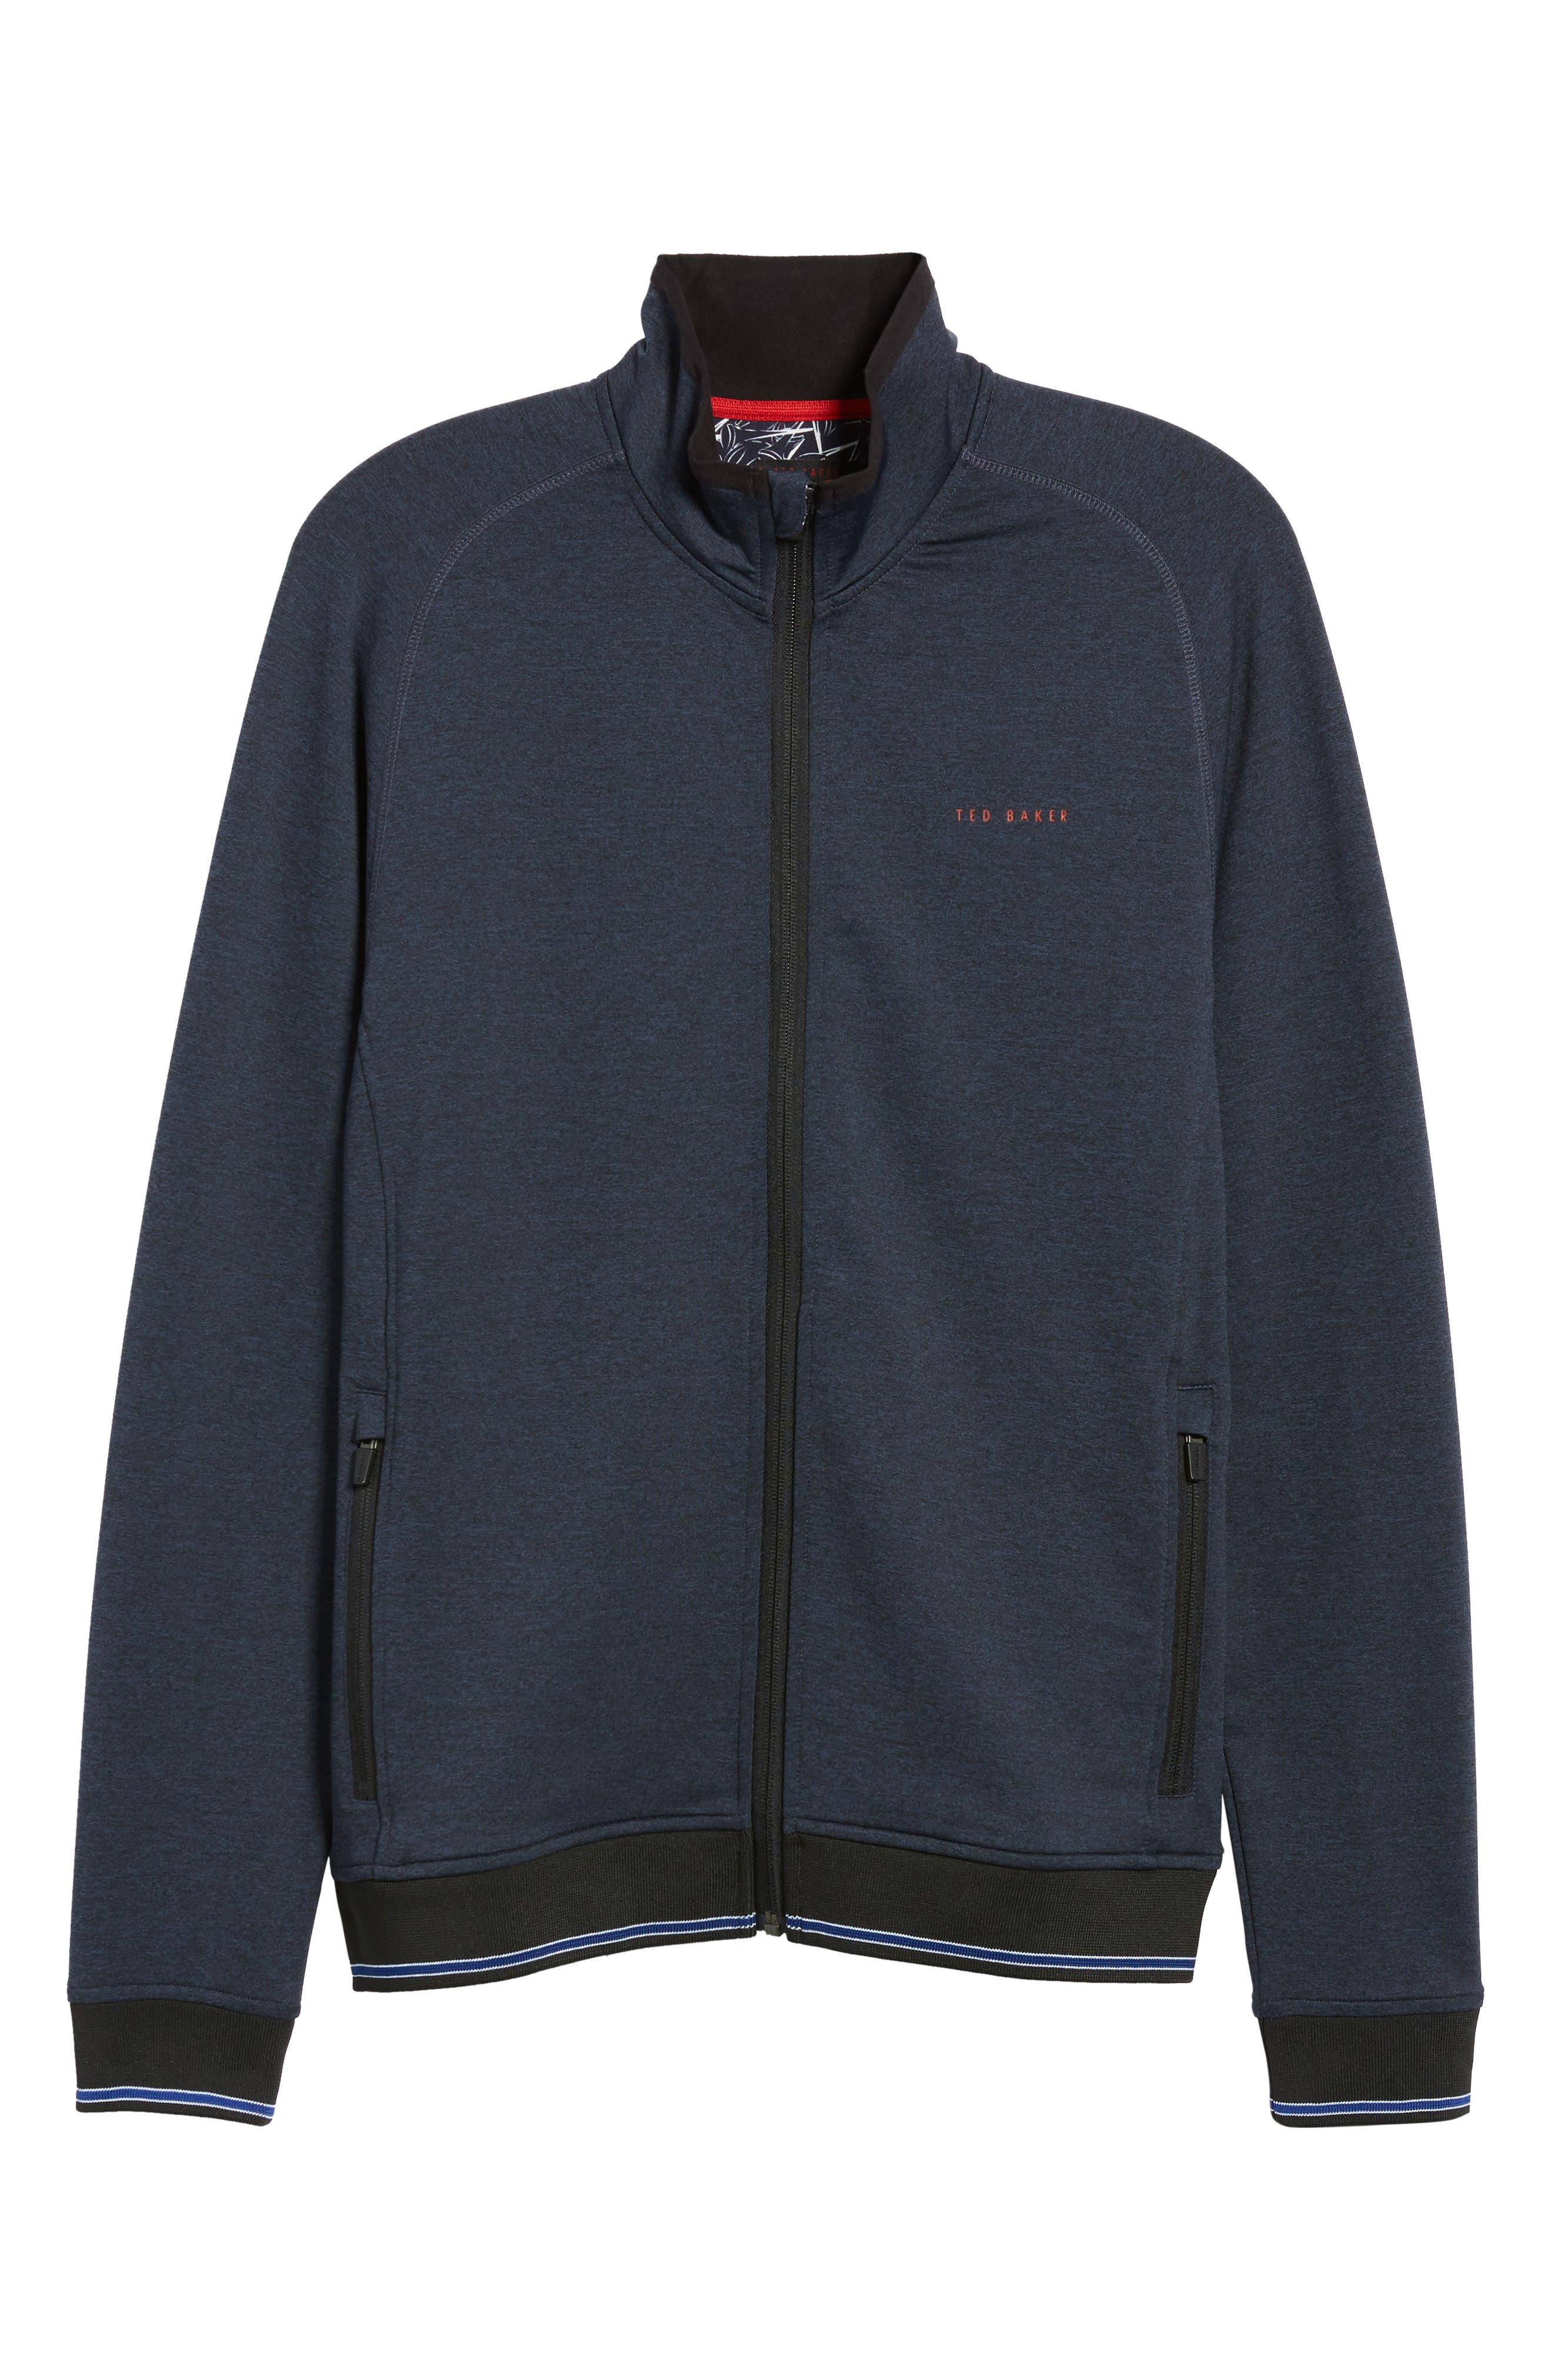 Parway Knit Golf Jacket,                             Alternate thumbnail 6, color,                             410